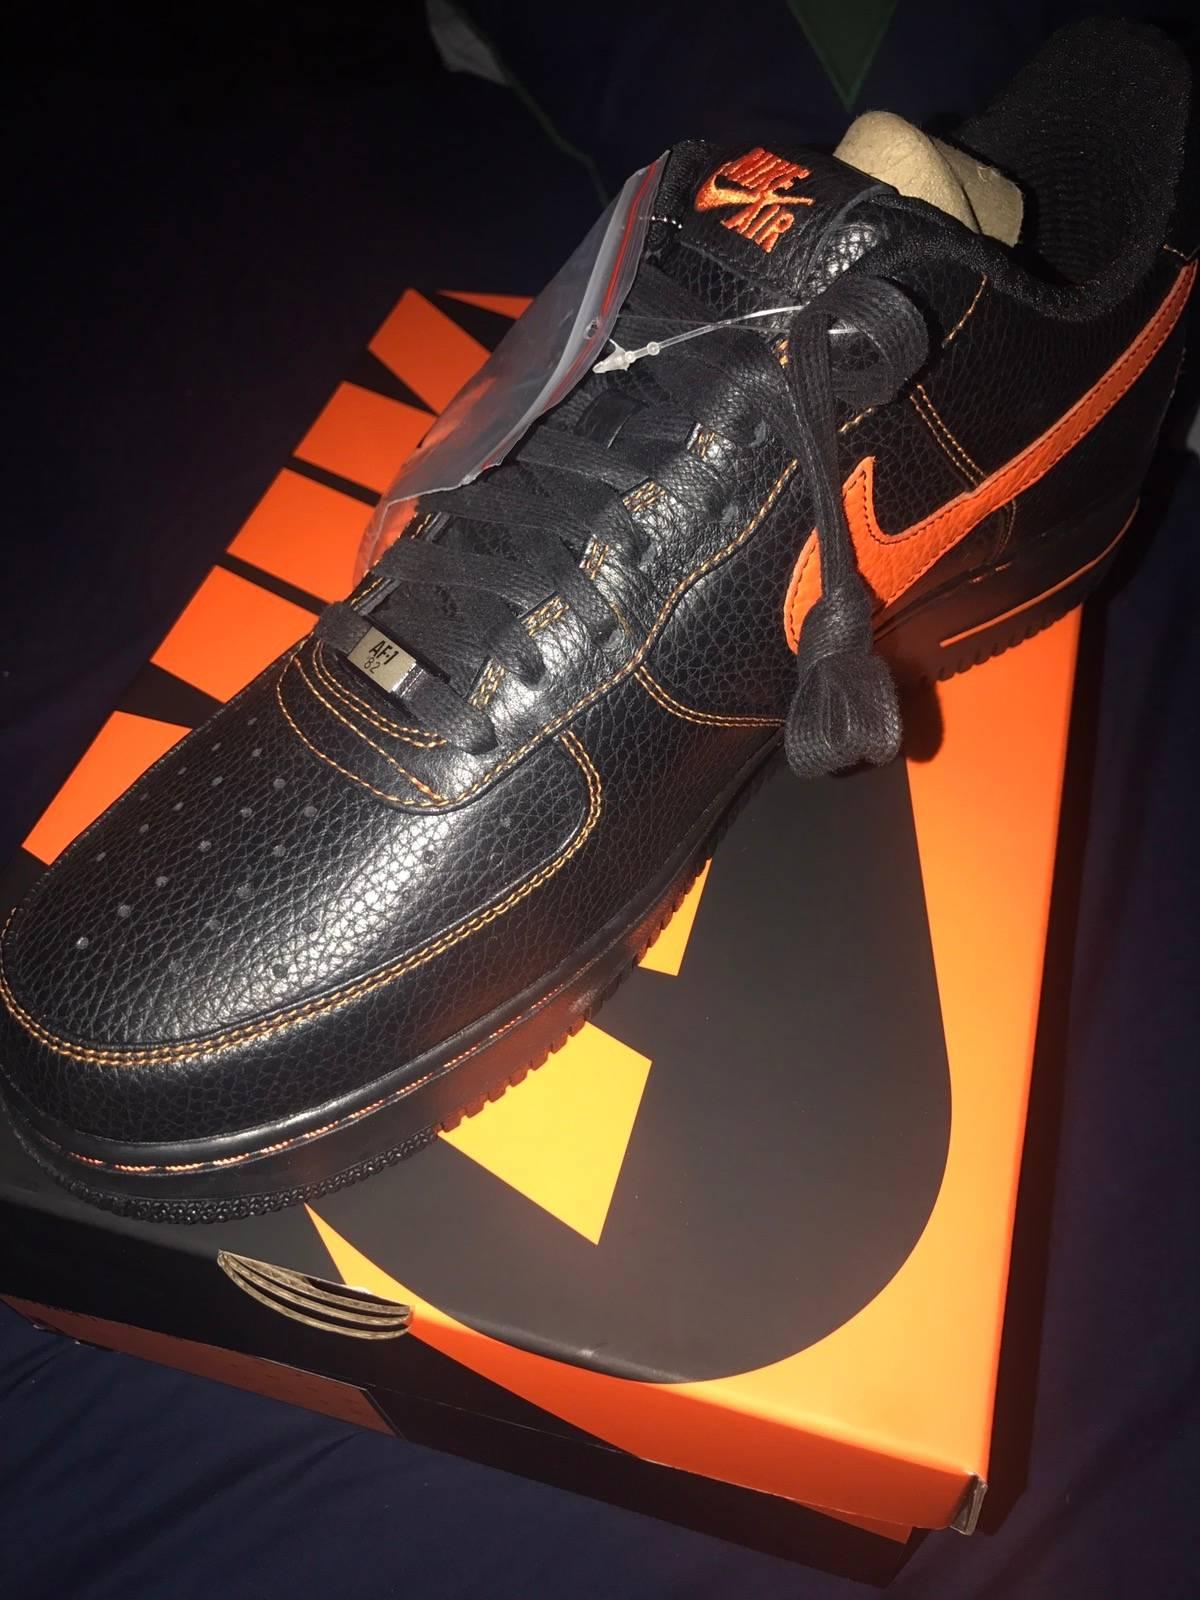 Vlone Nikelab X Vlone Air Force One Size 12.5 $1800